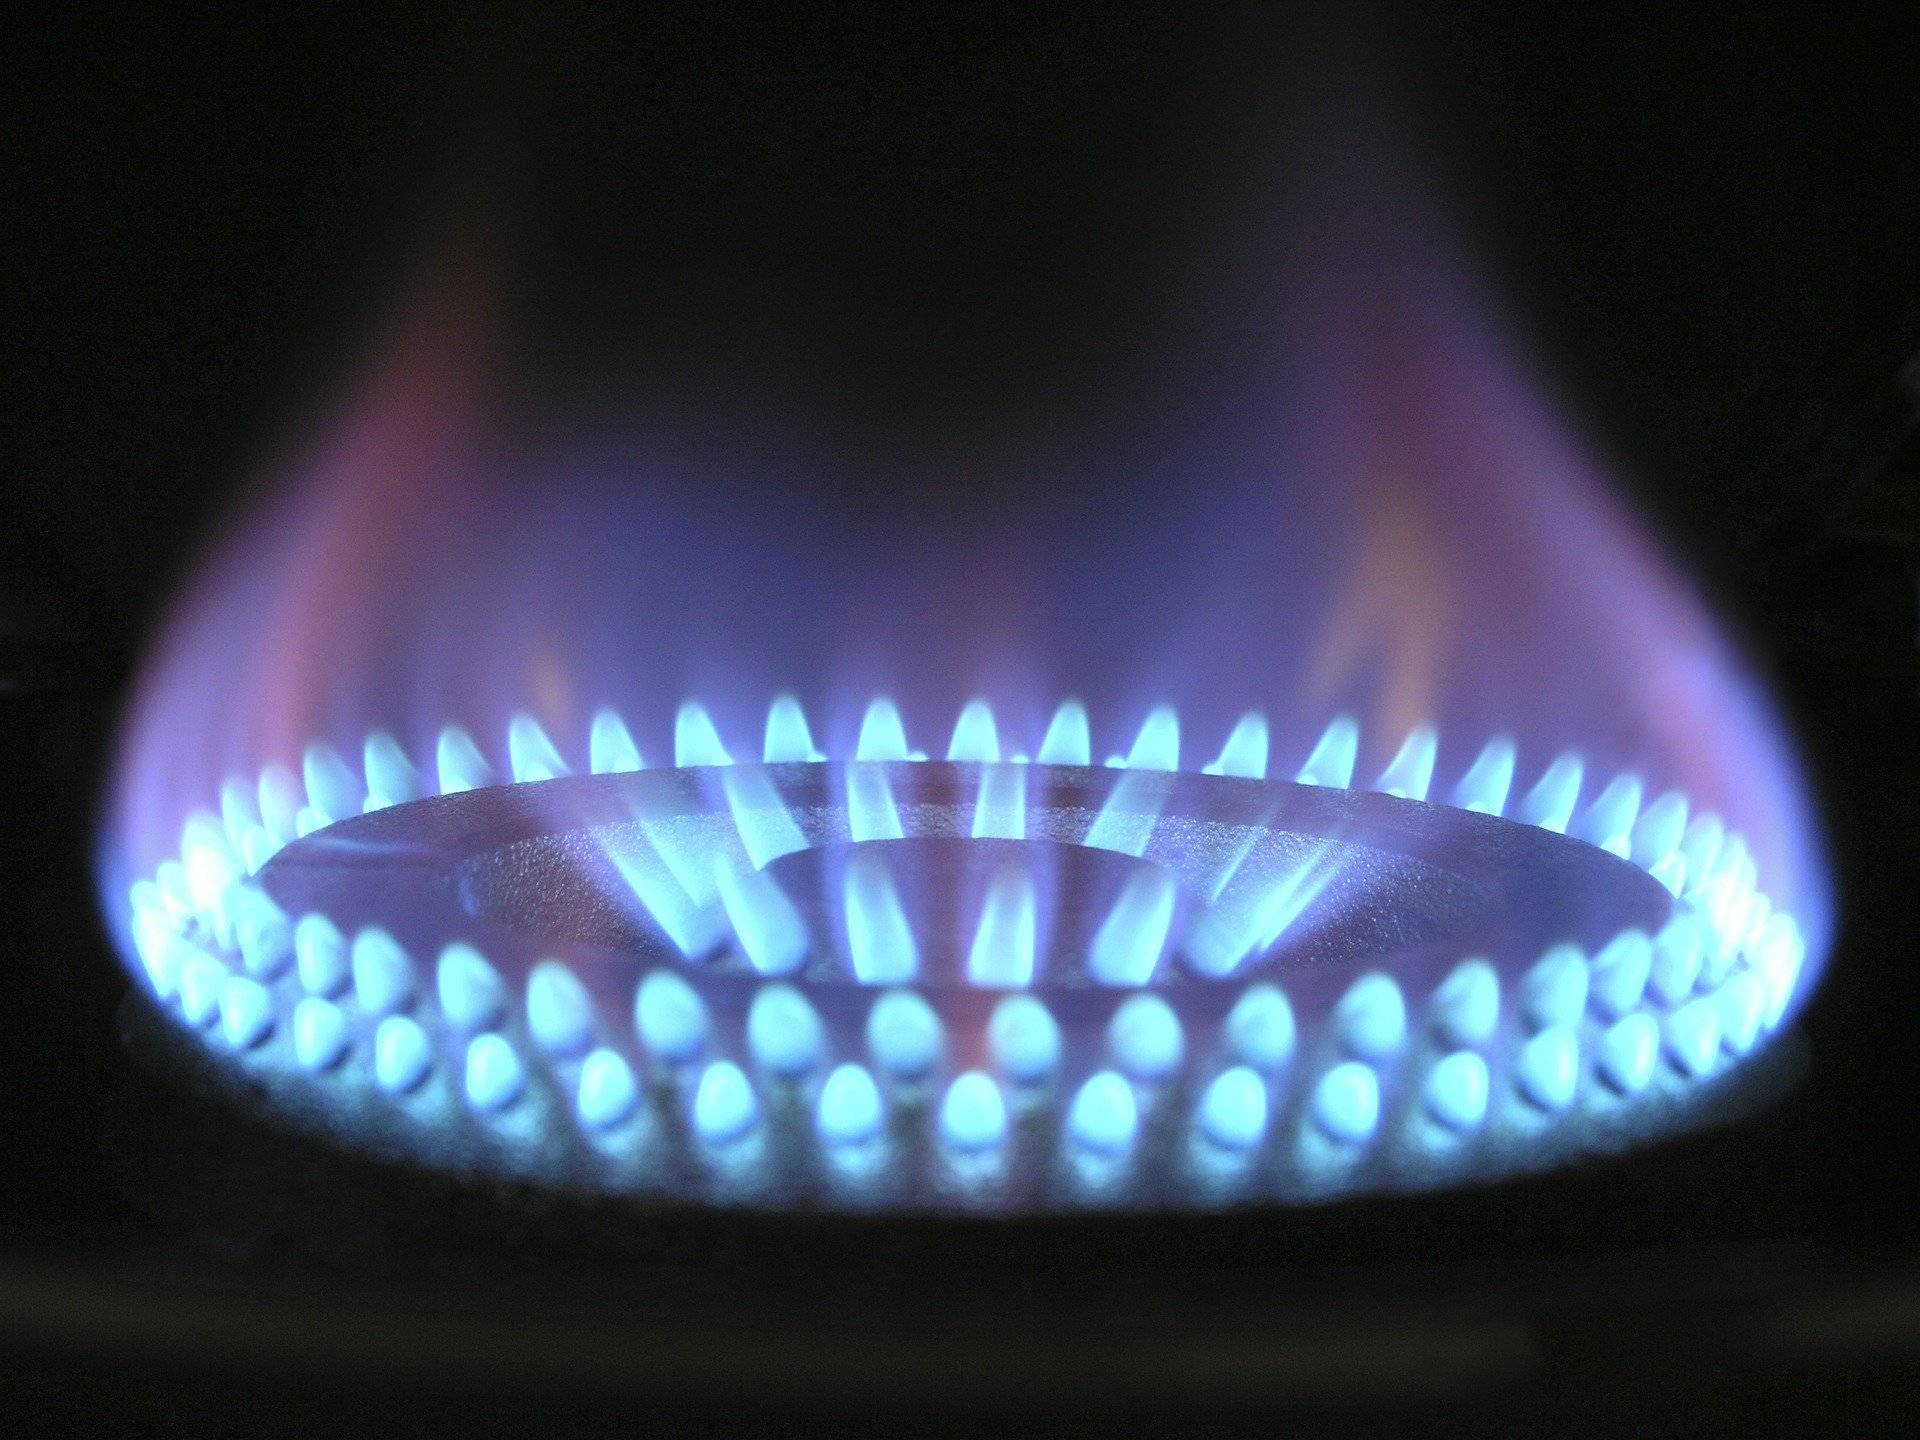 Разъяснения АМКУ относительно ситуации на рынках природного газа. Адвокат в Запорожье. Юридическое бюро Линия права